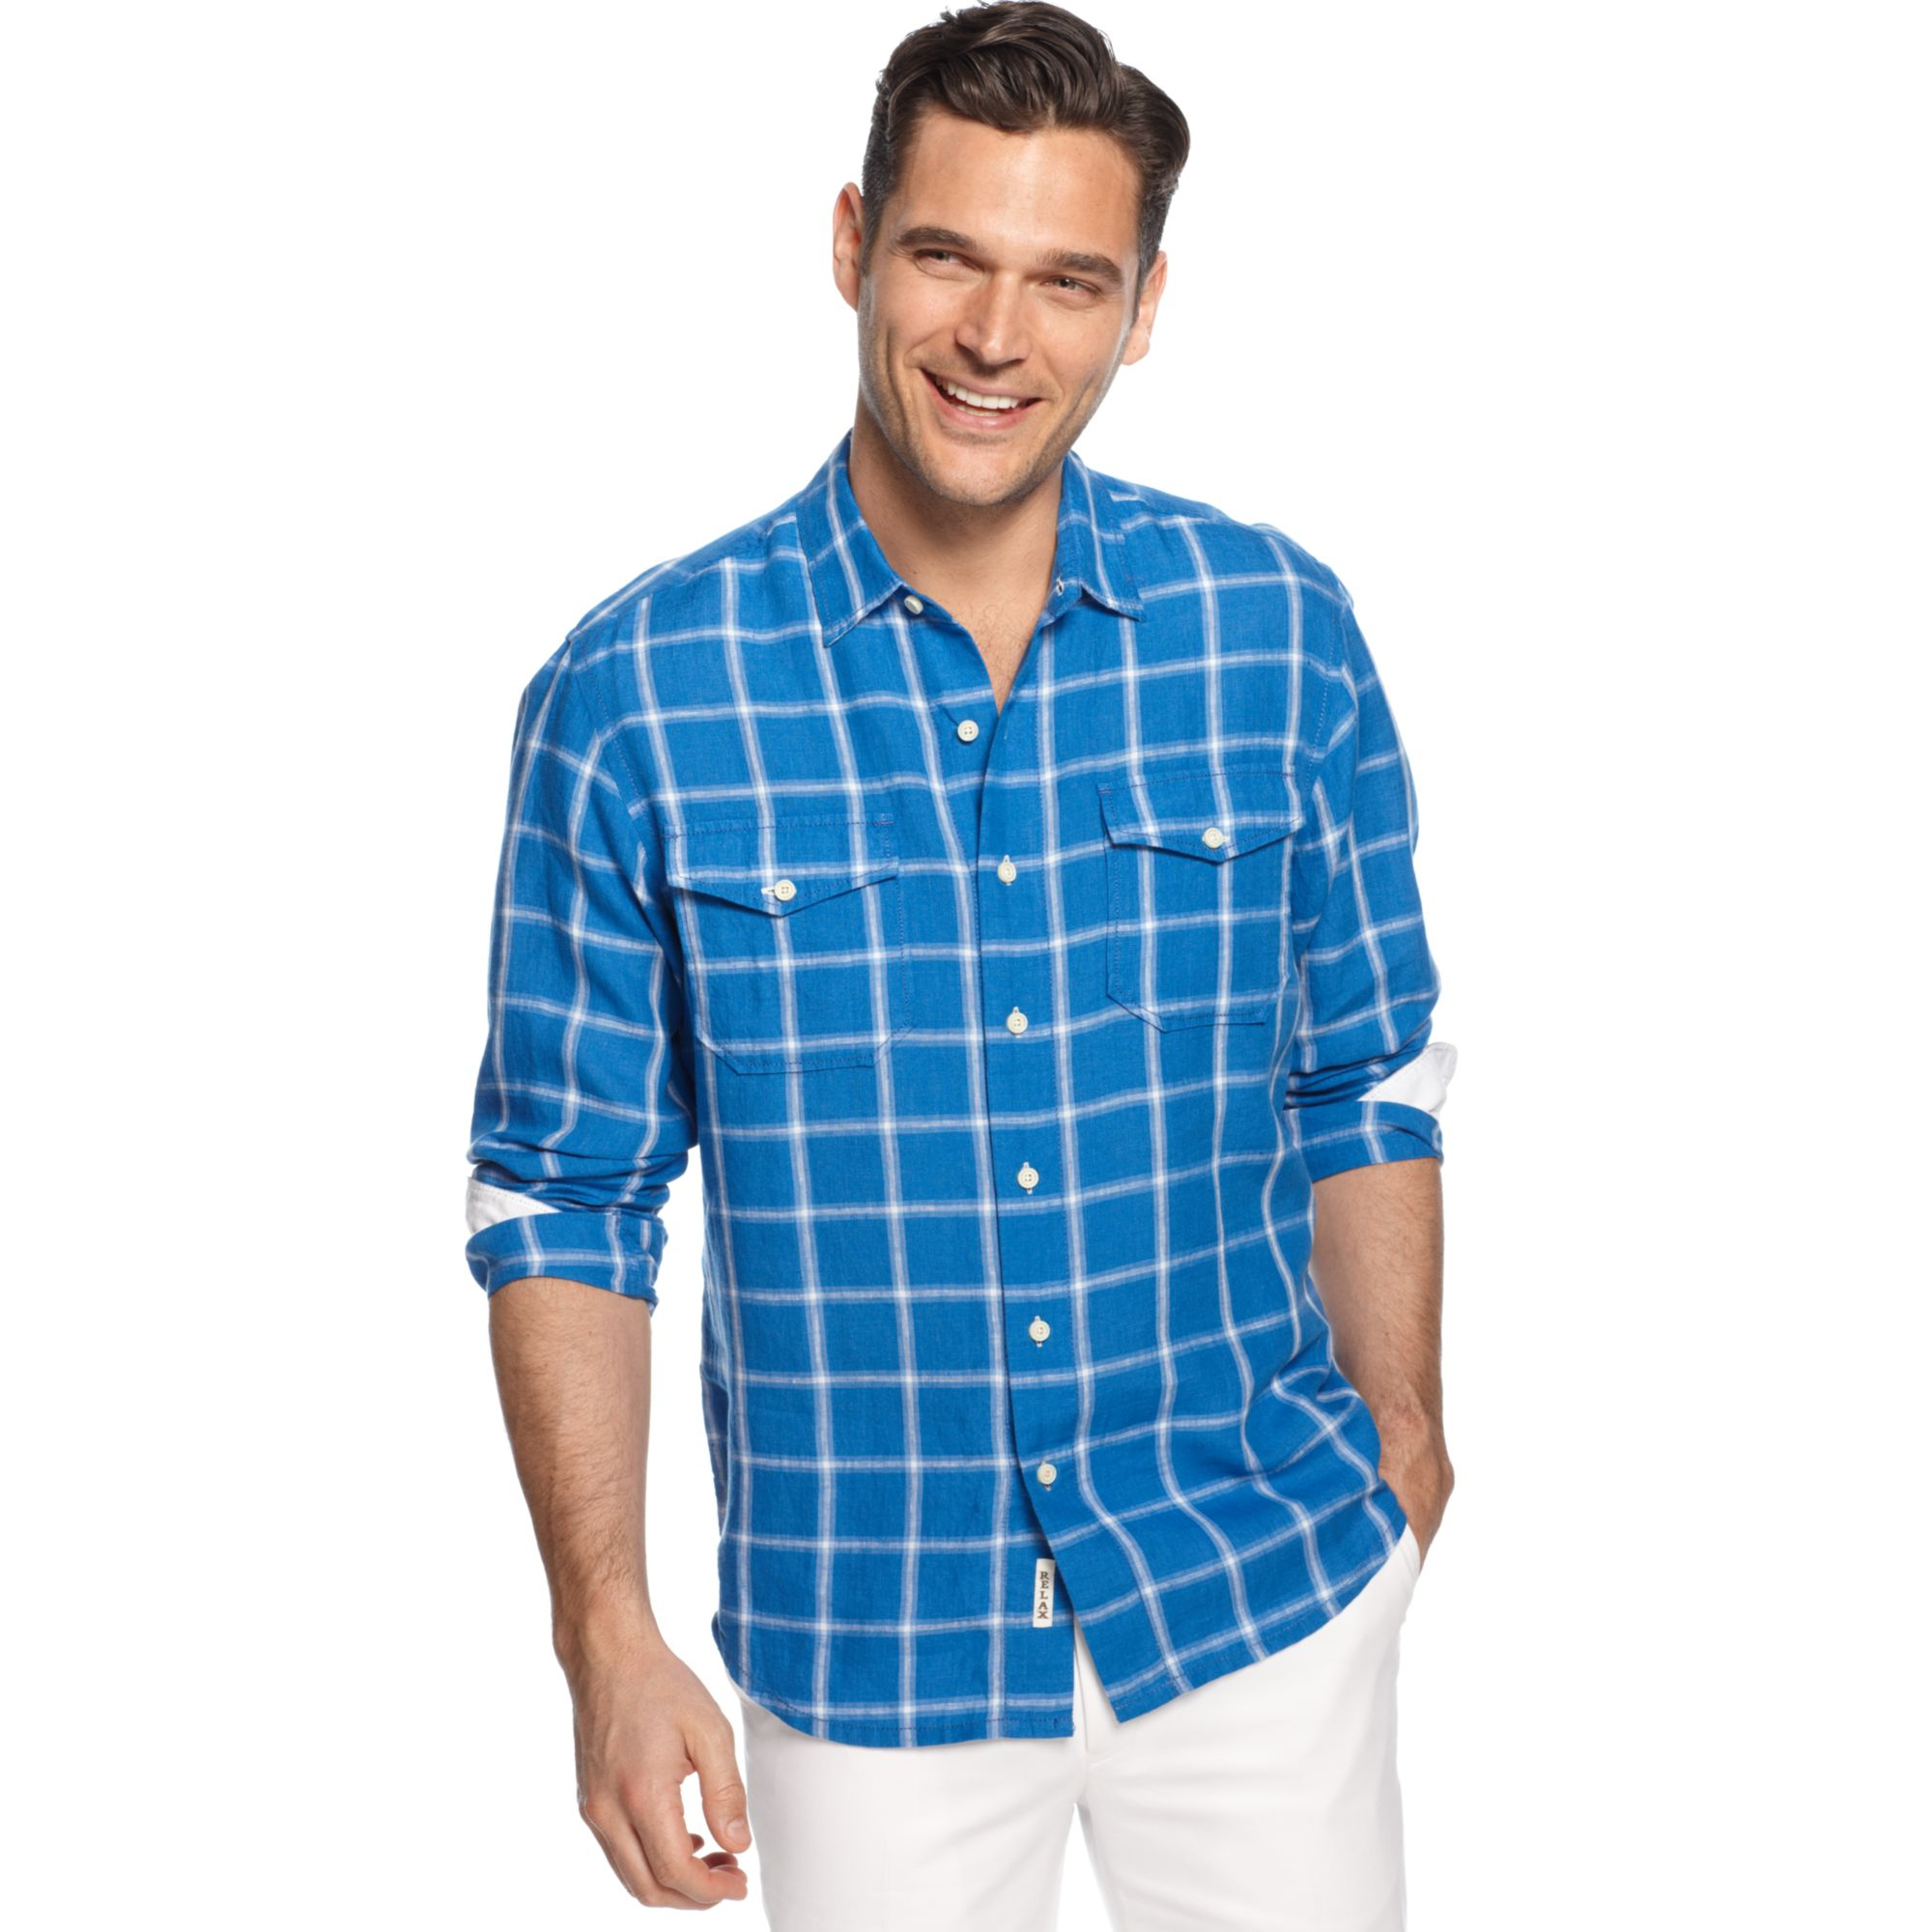 Tommy bahama long sleeve montauk breezer linen shirt in for Tommy bahama christmas shirt 2014